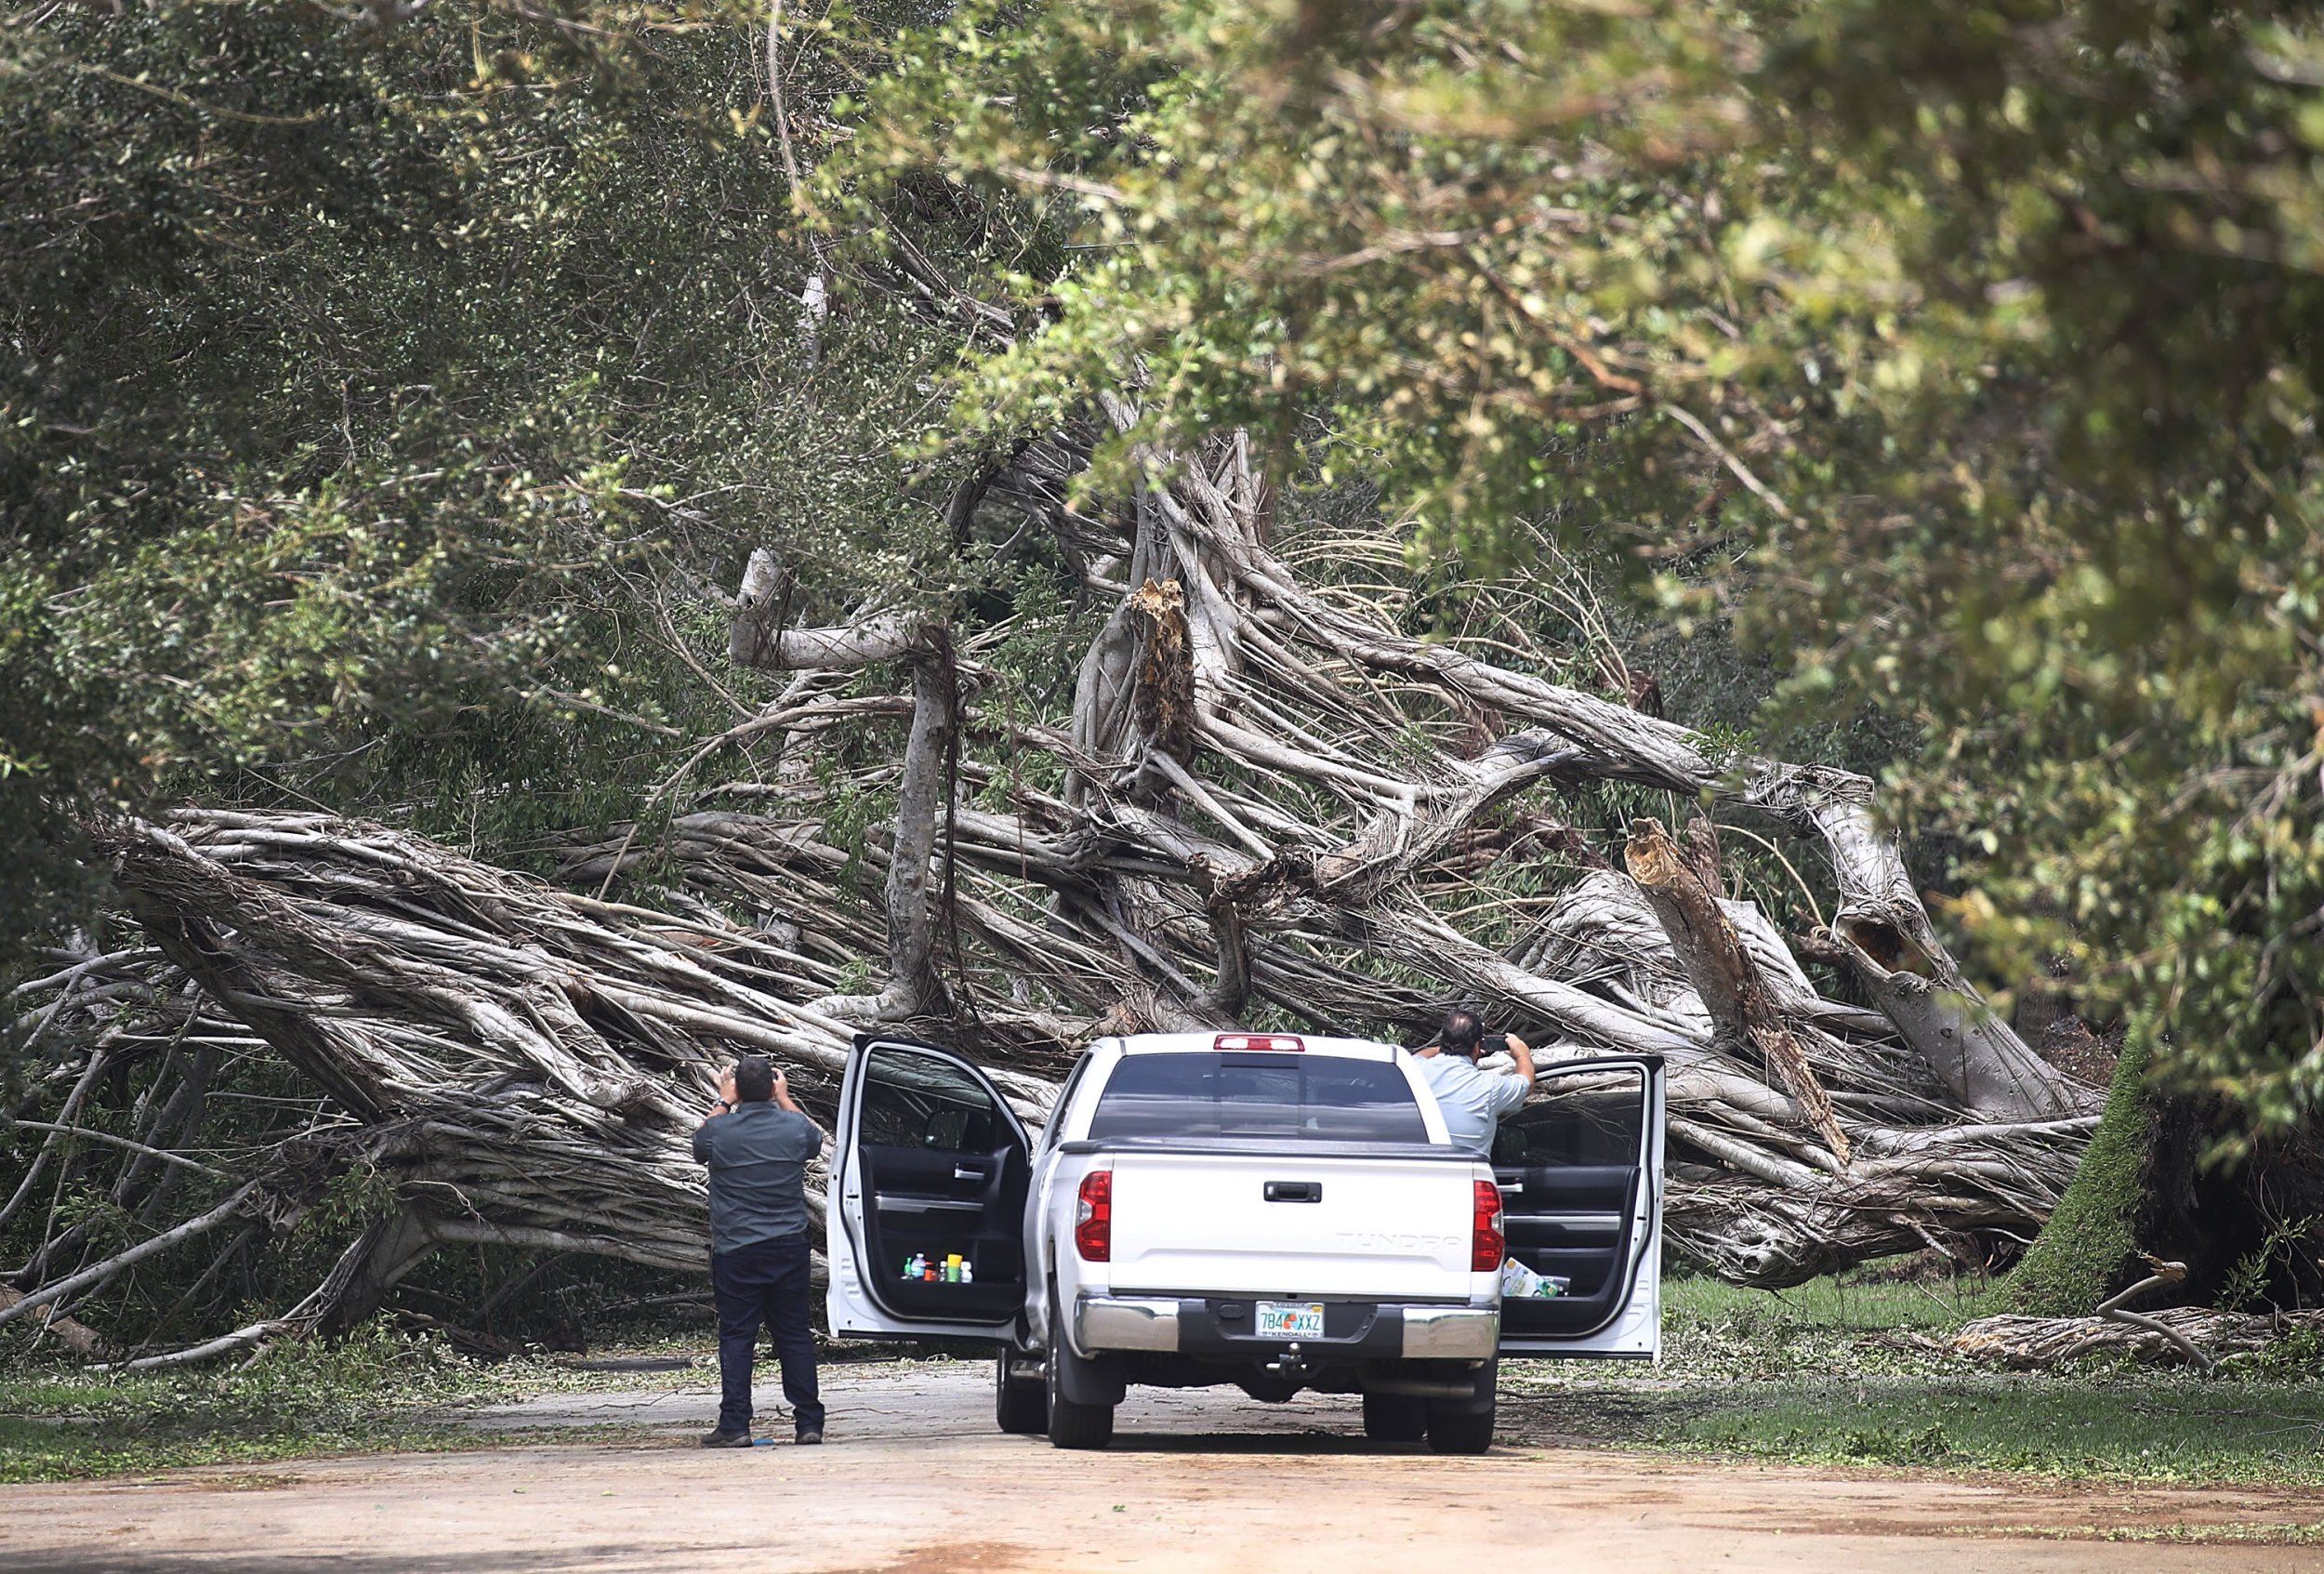 Hurricane Irma Was A Nothingburger Says Pastor Who Prayed